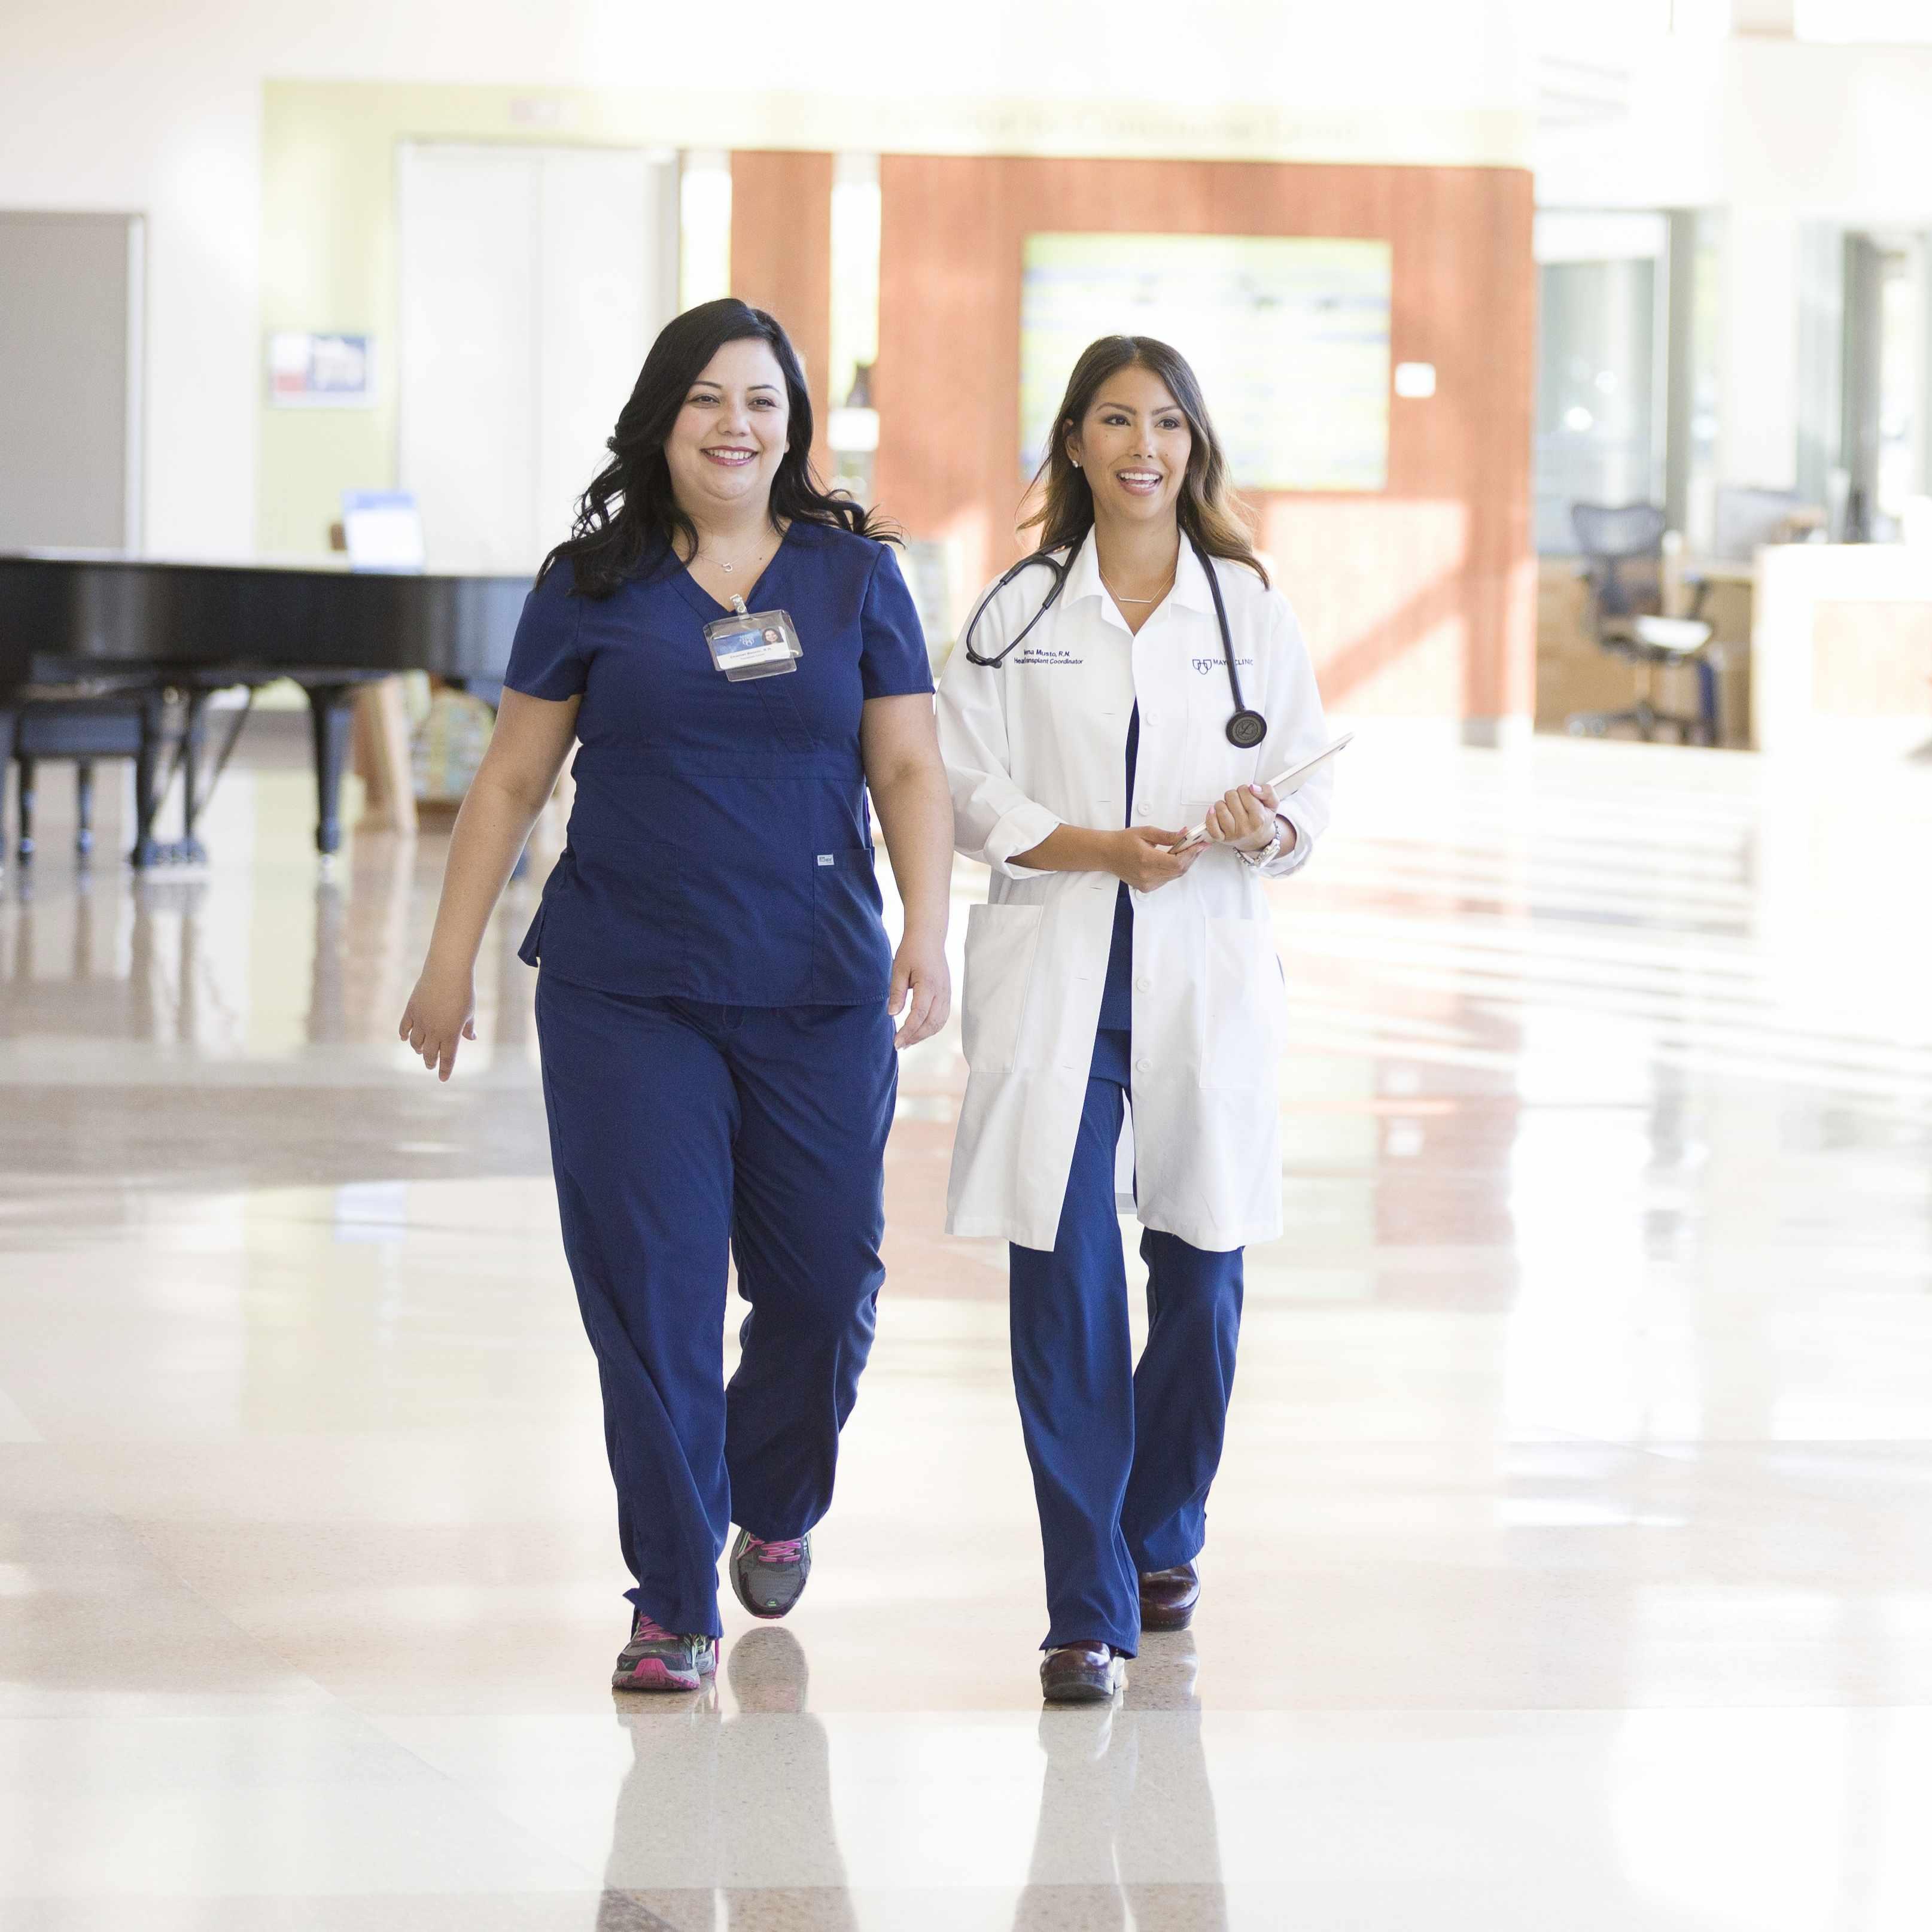 Mayo Clinic medical staff meeting walking in a hospital lobby